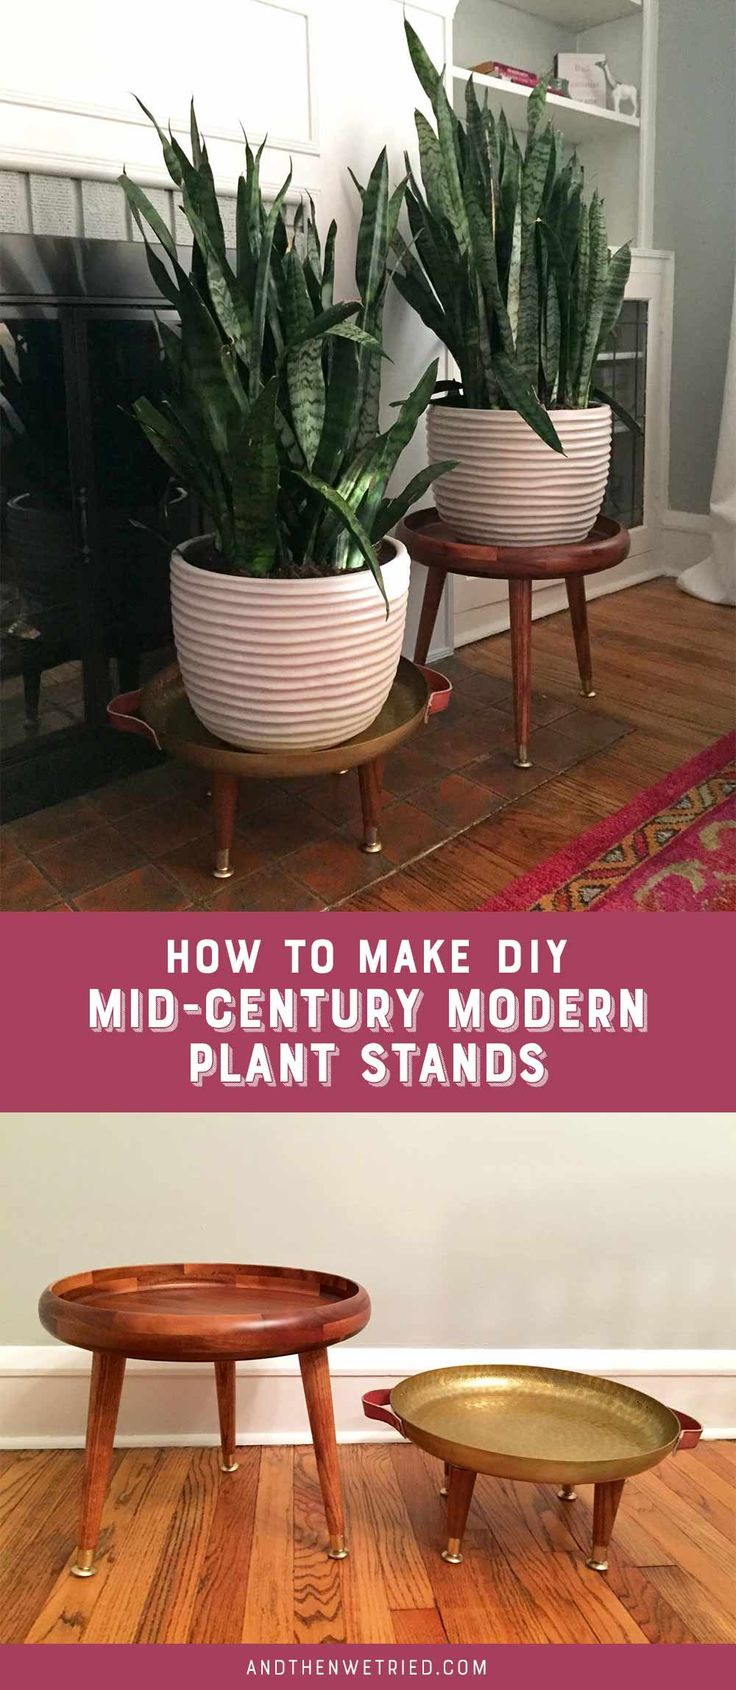 DIY Mid-Century Plant Stands